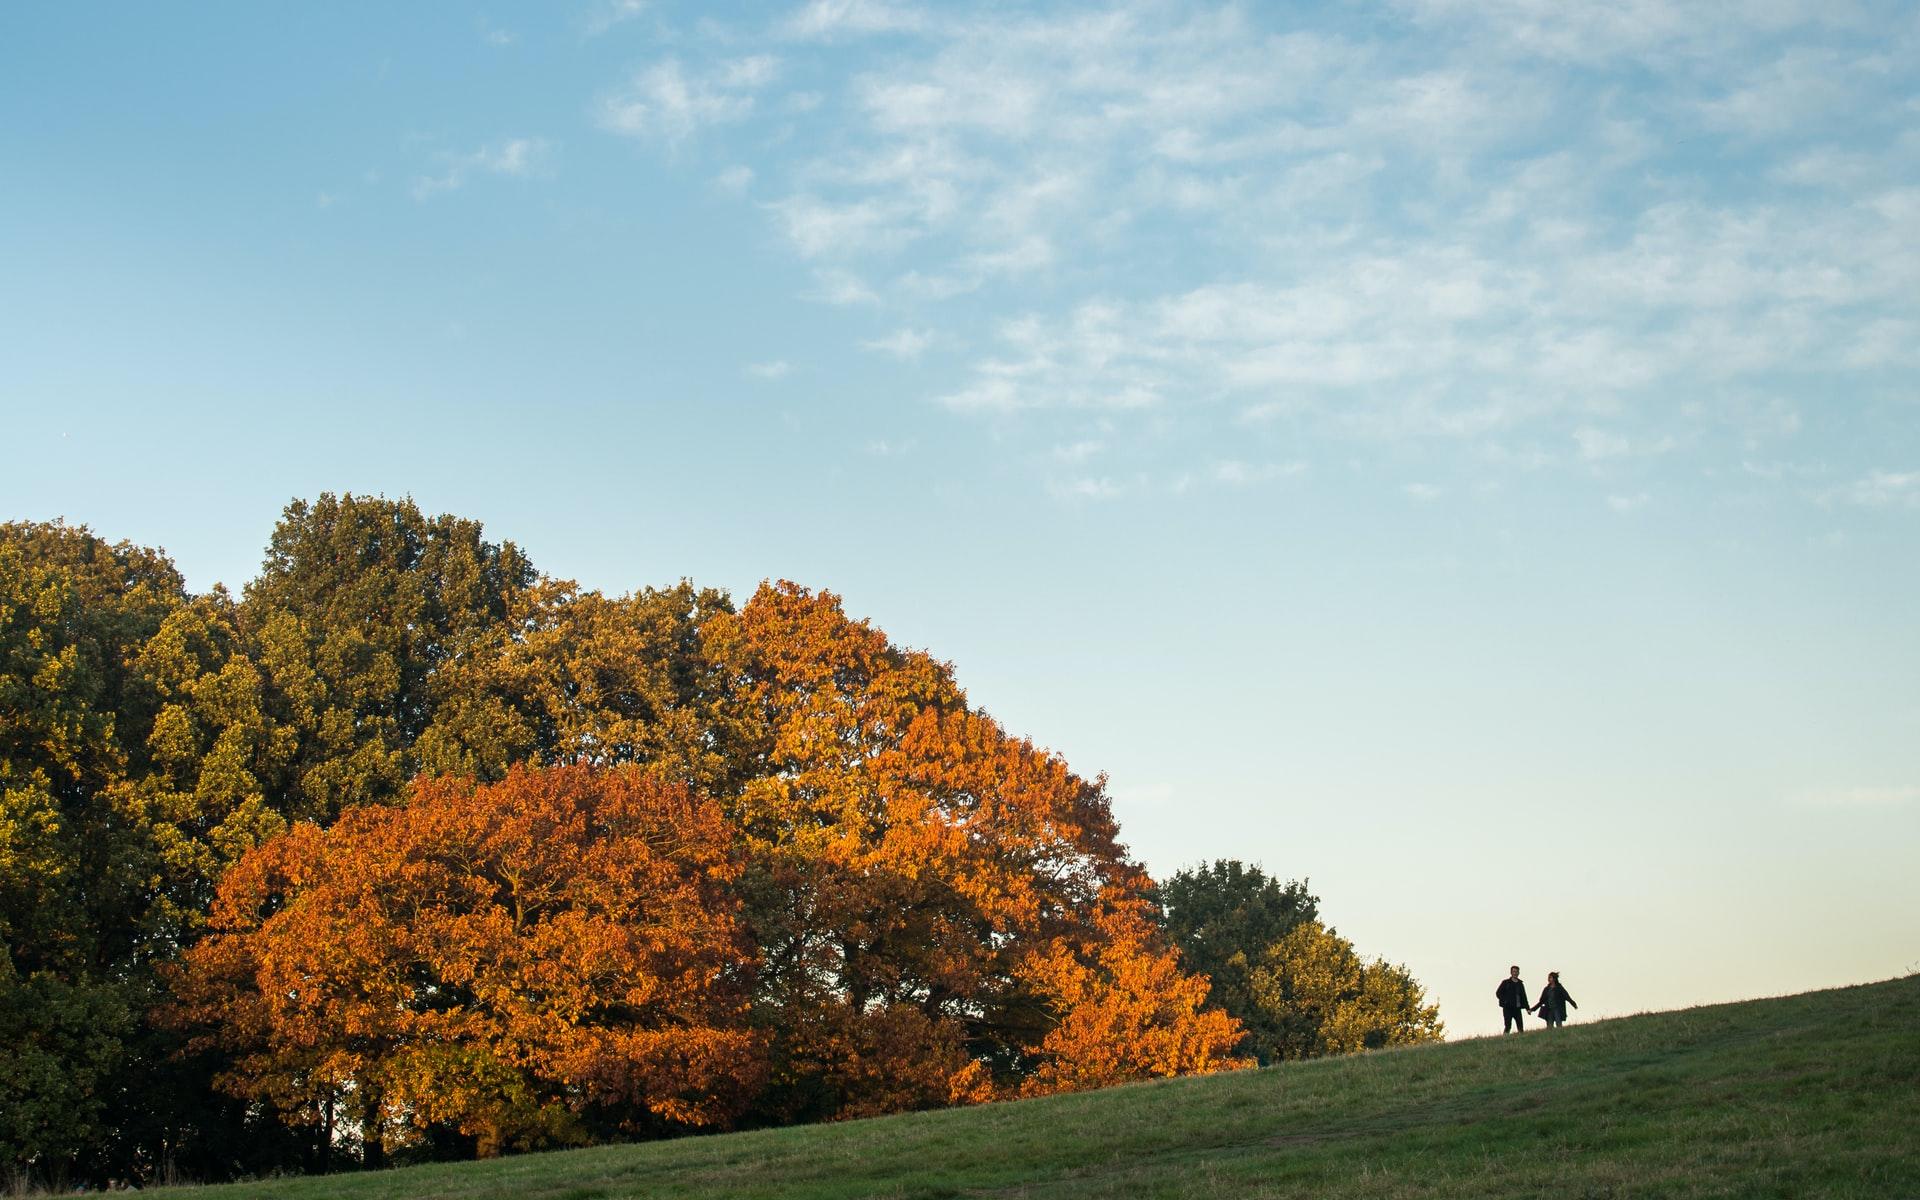 london park in autumn